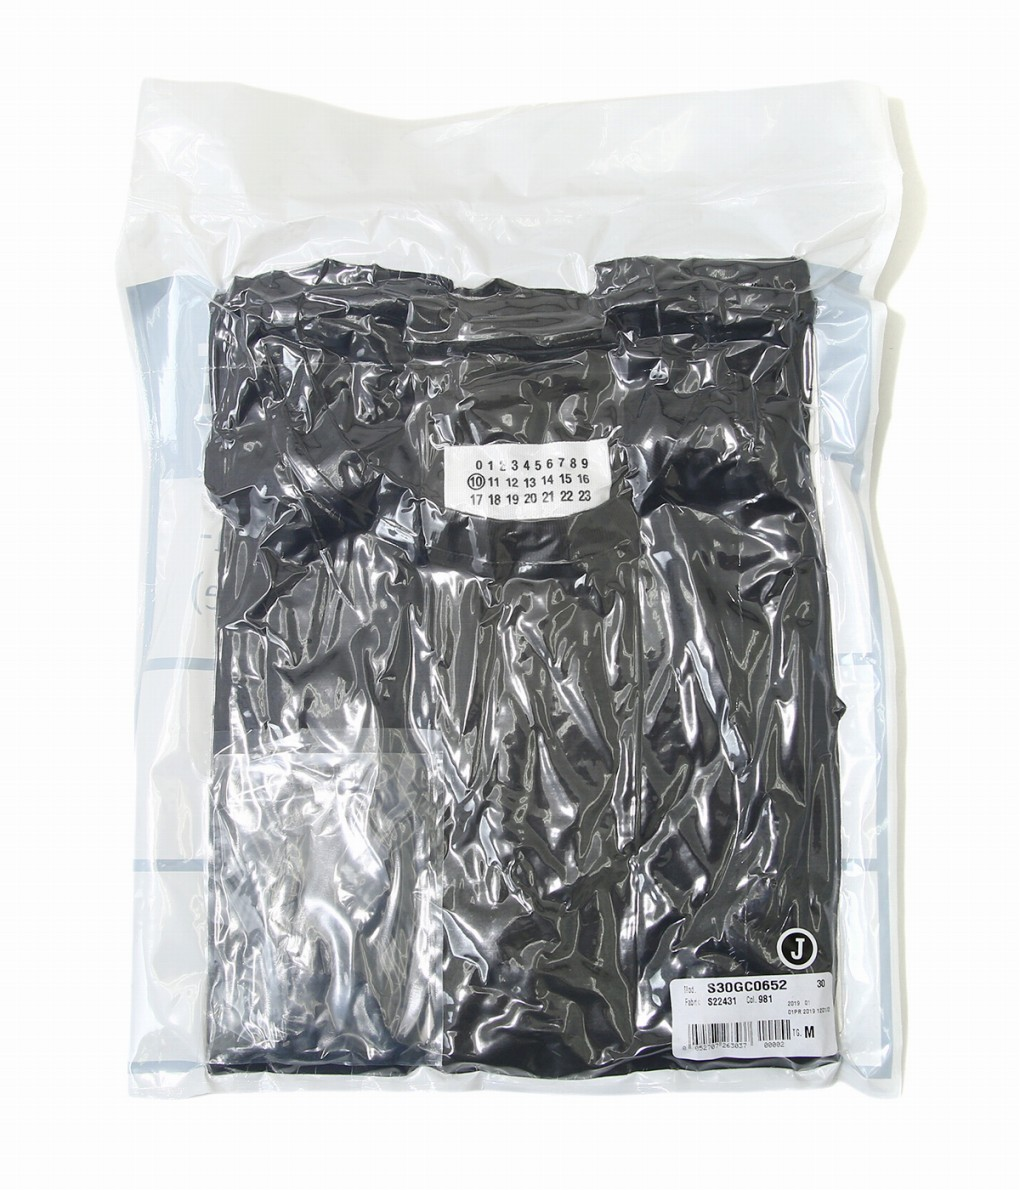 Maison Margiela / メゾン マルジェラ : PACK TEE-BLACK- : メゾン マルジェラ パック ティー メンズ : S30GC0652 【RIP】【BJB】